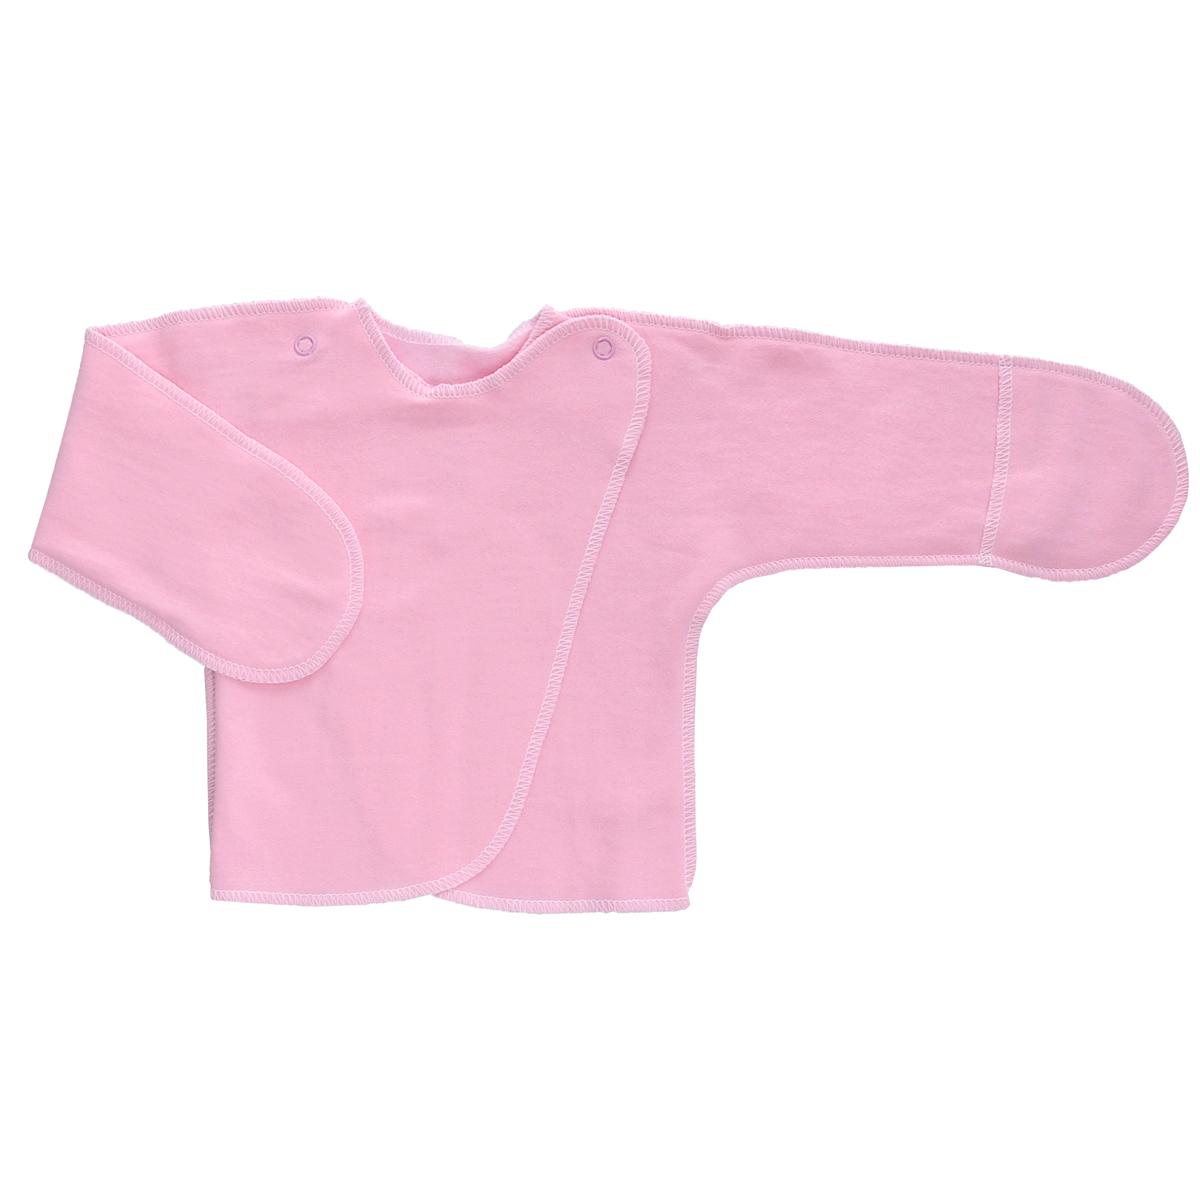 Распашонка Трон-Плюс, цвет: розовый. 5023. Размер 68, 6 месяцев